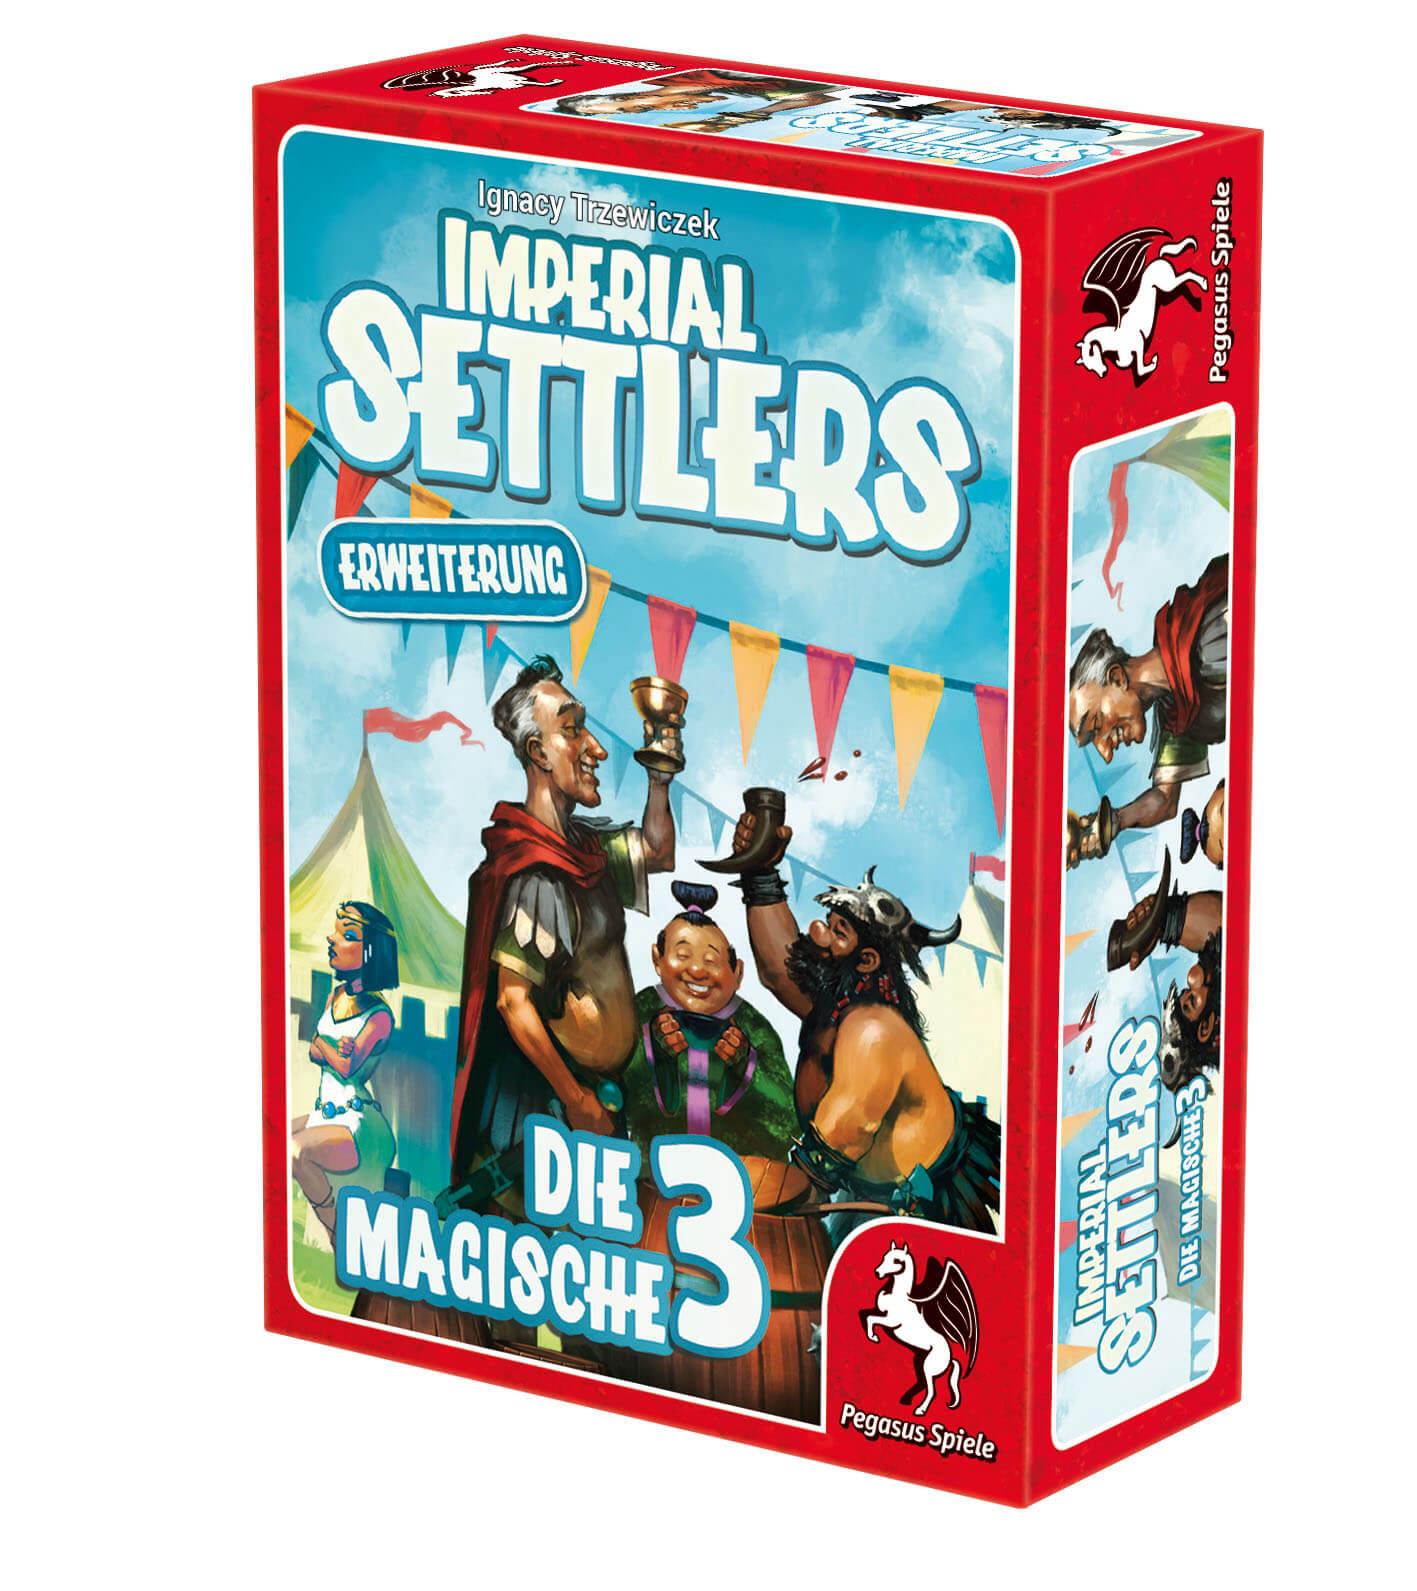 Schachtel Vorderseite rechts- Imperial Settlers - Die magische 3